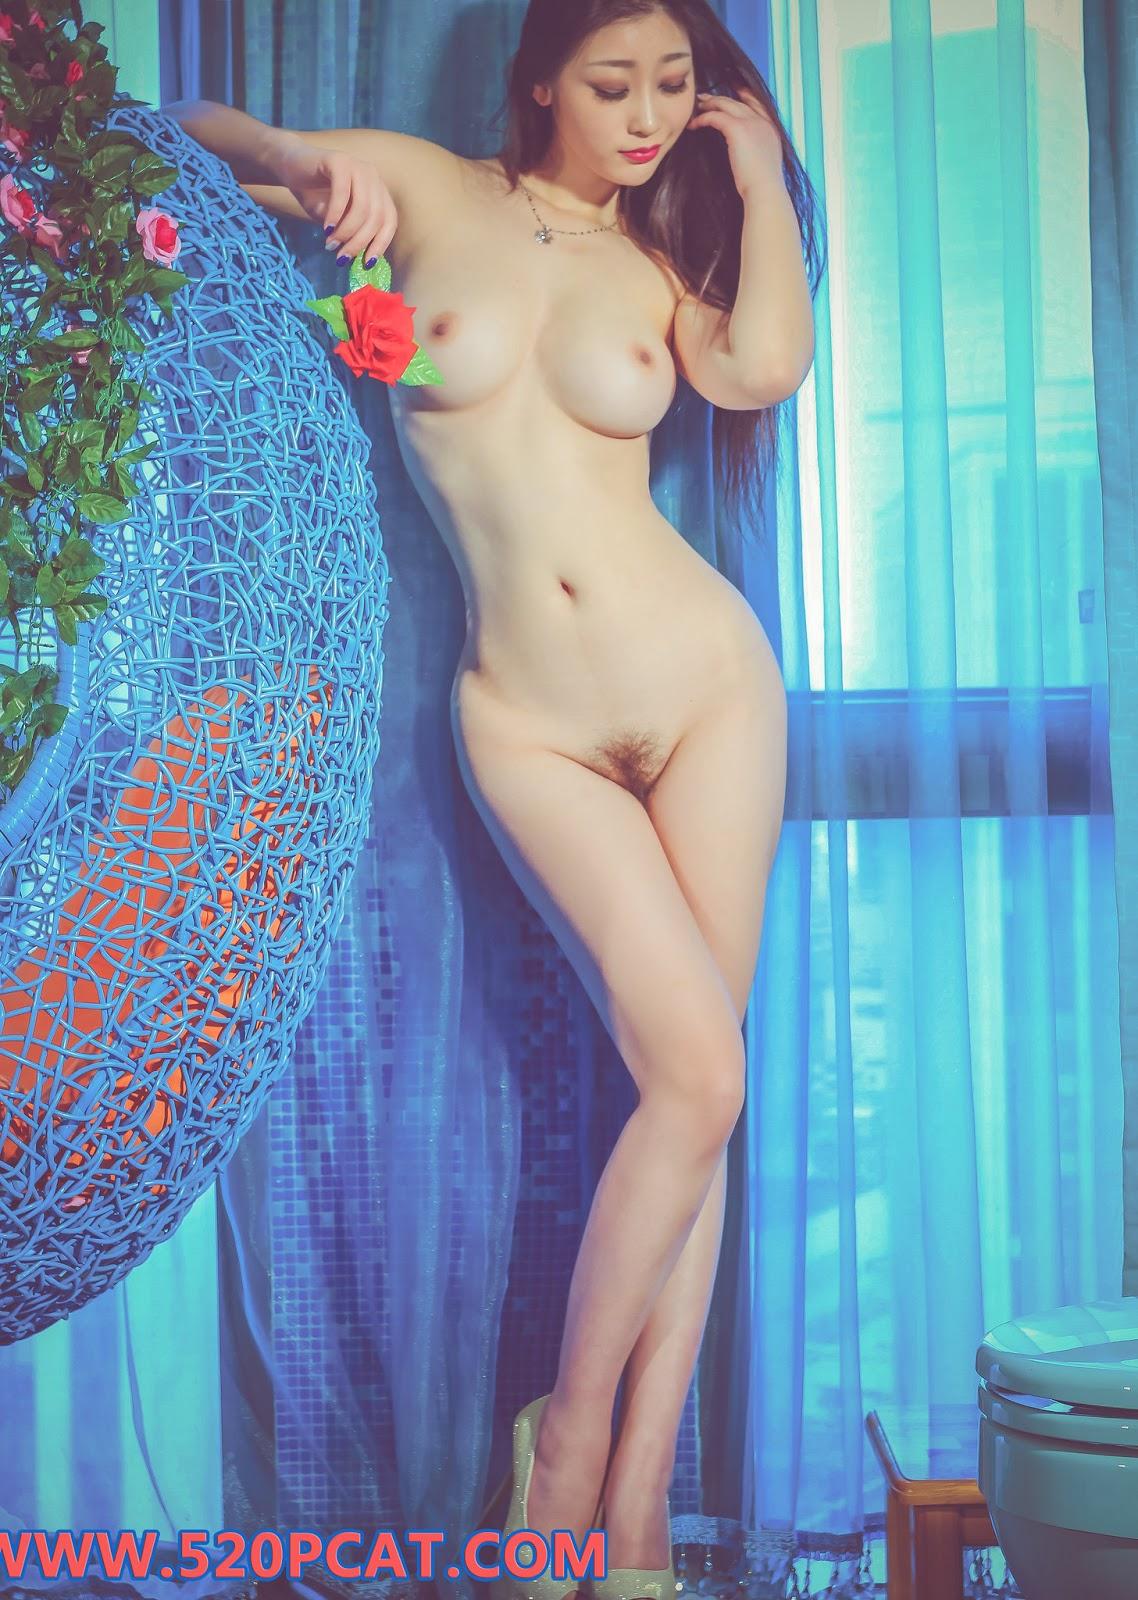 Chinese Model 妲己_Toxic Nude Photoshoot (39 Pict)